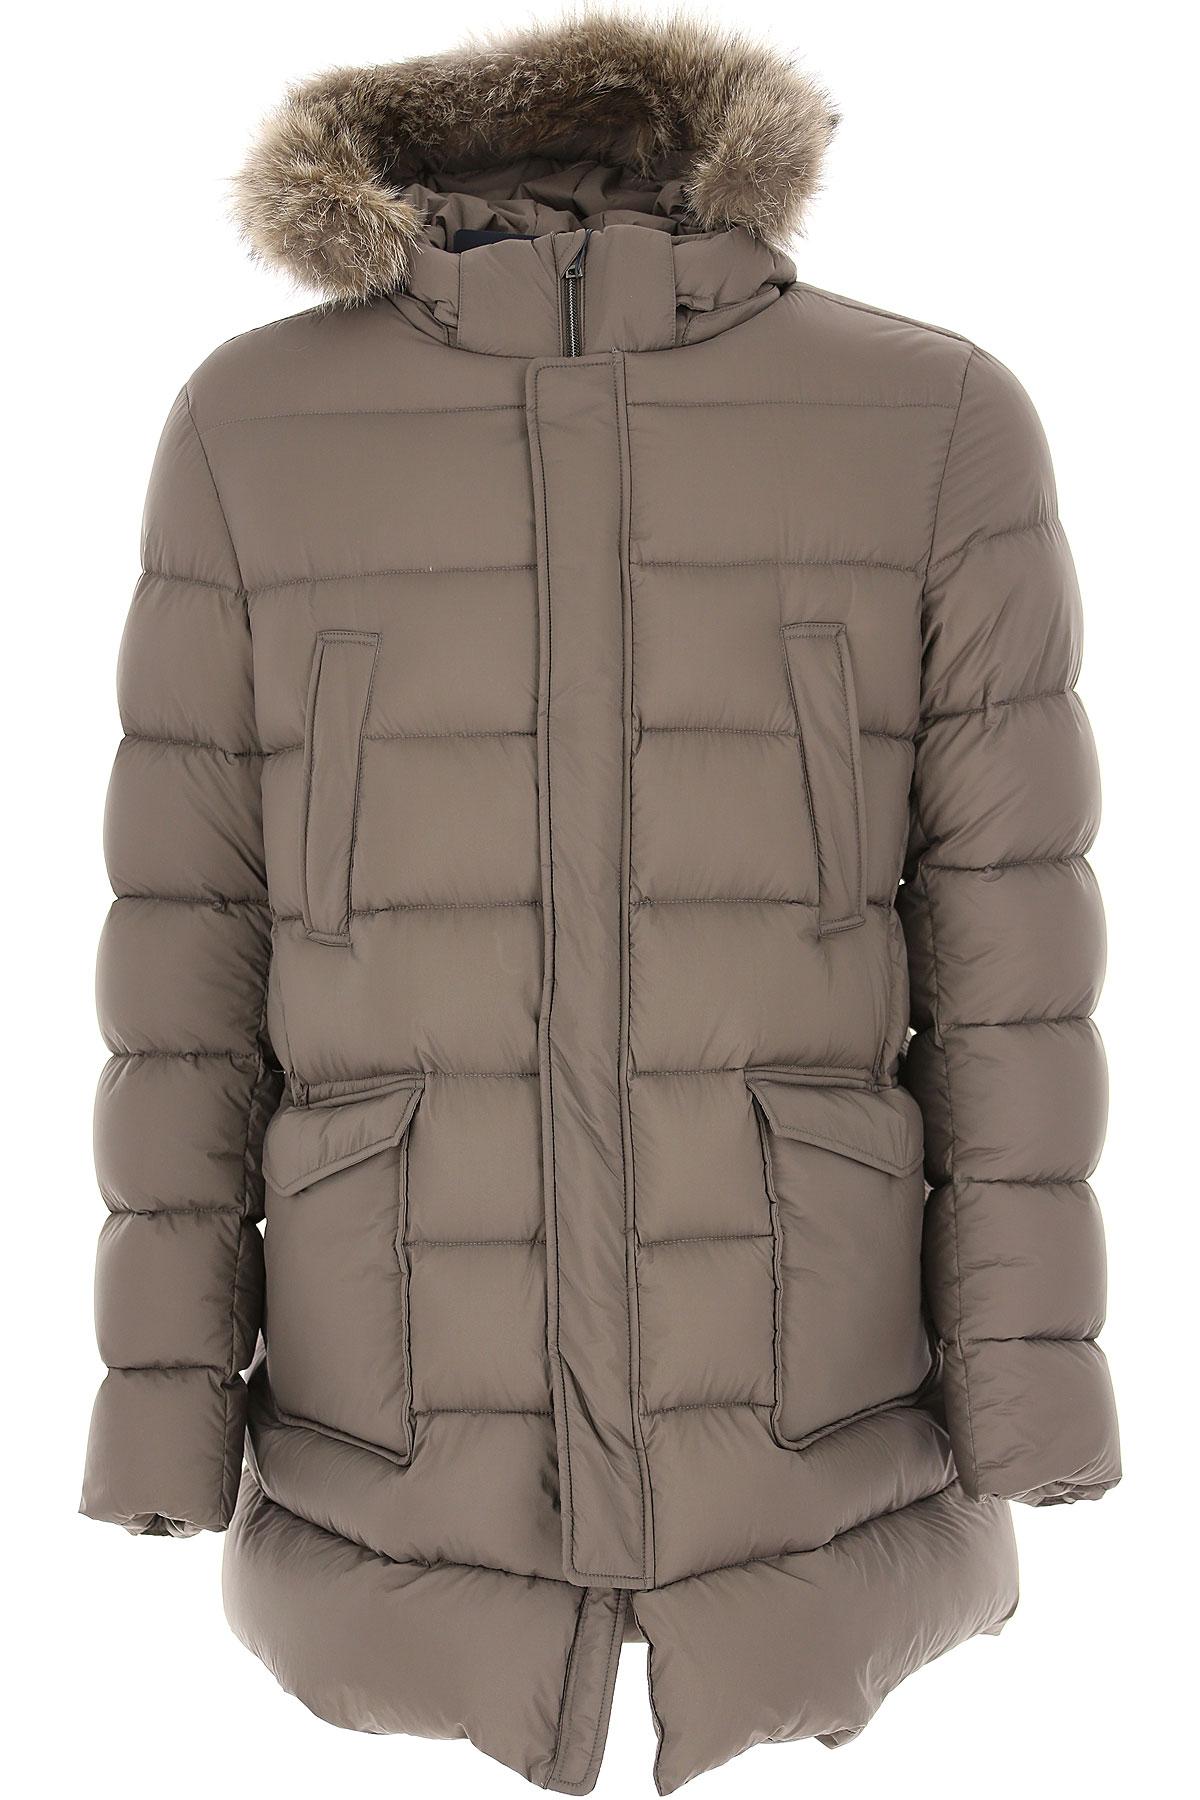 Herno Down Jacket for Men, Puffer Ski Jacket On Sale, Turtle Dove, polyamide, 2019, L XL